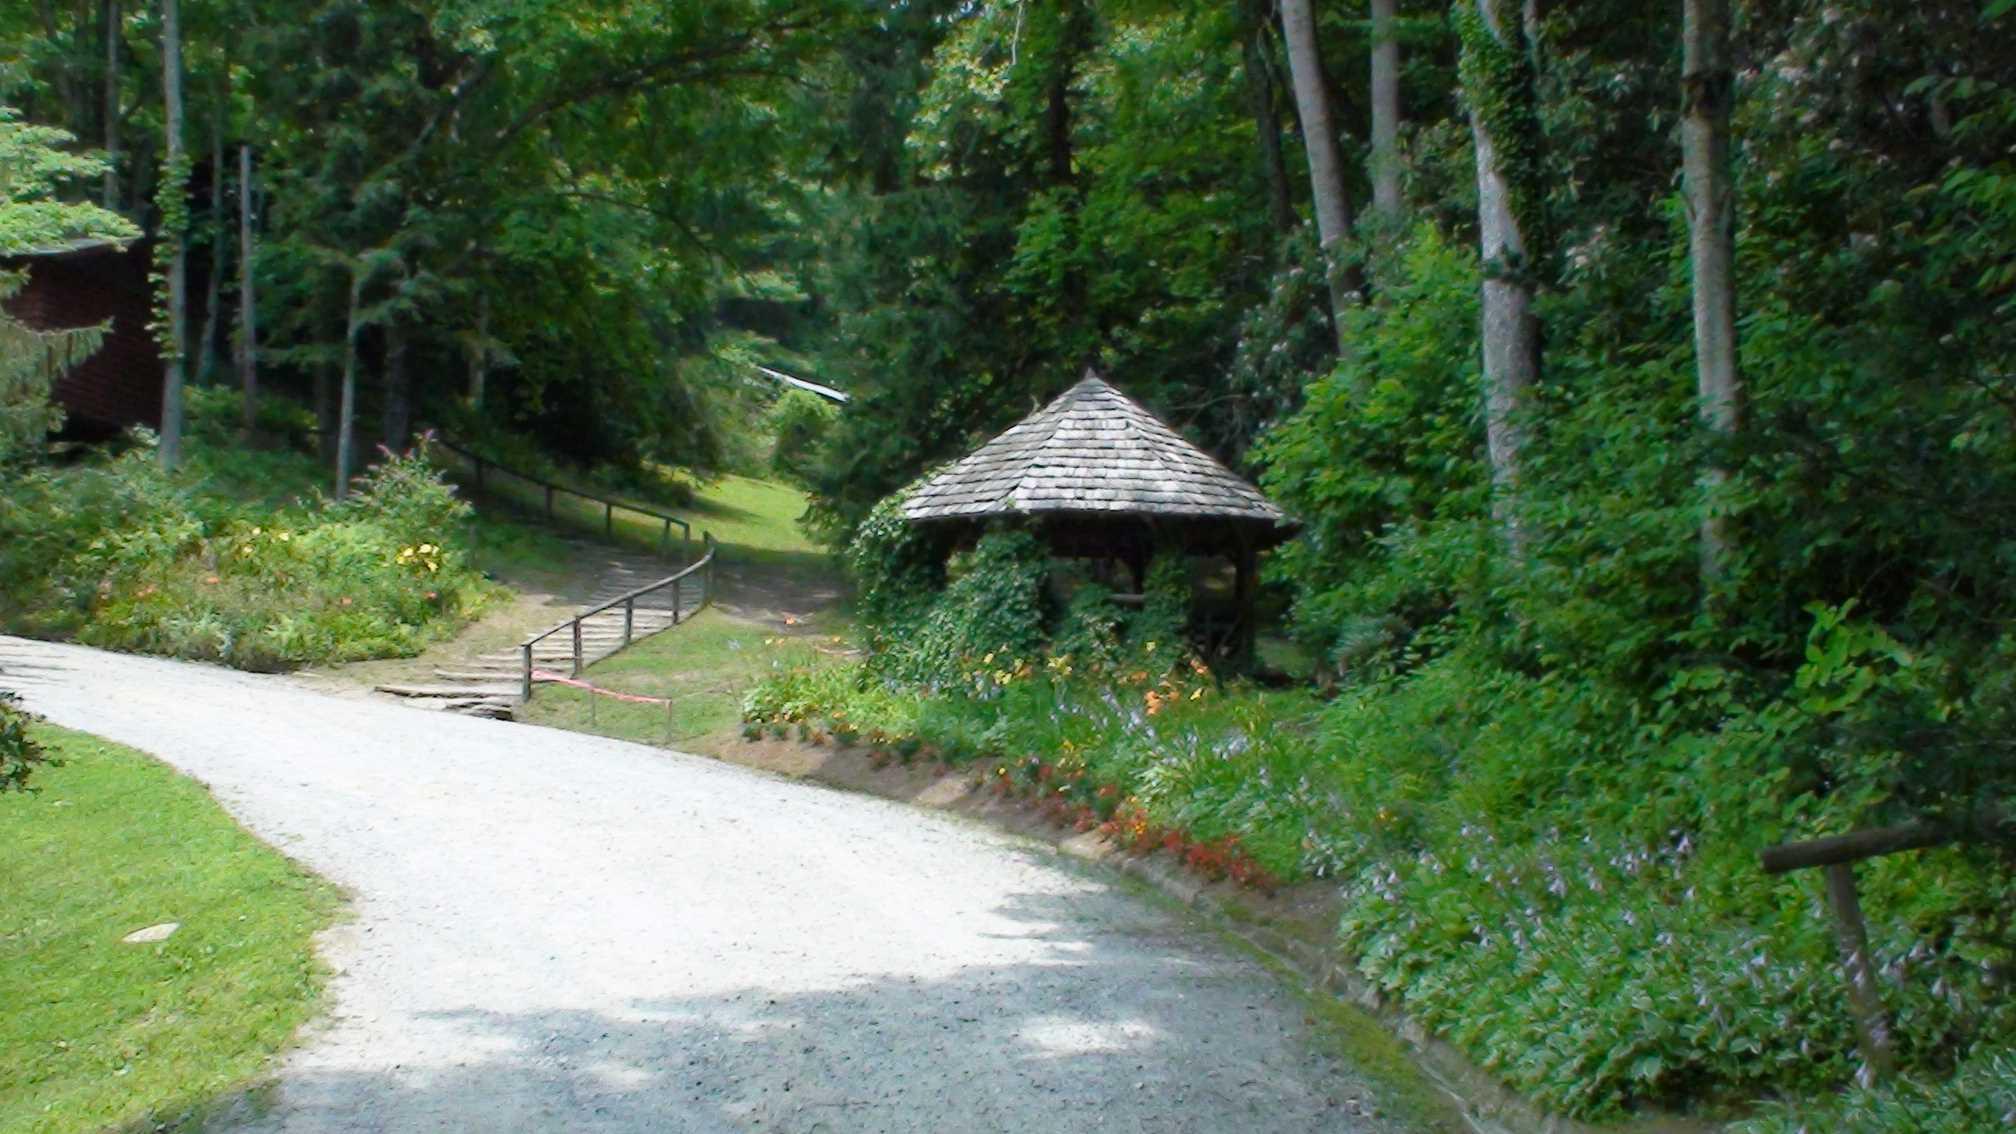 Summer Camp in North Carolina - Dr. Caputo | Palm Harbor ...